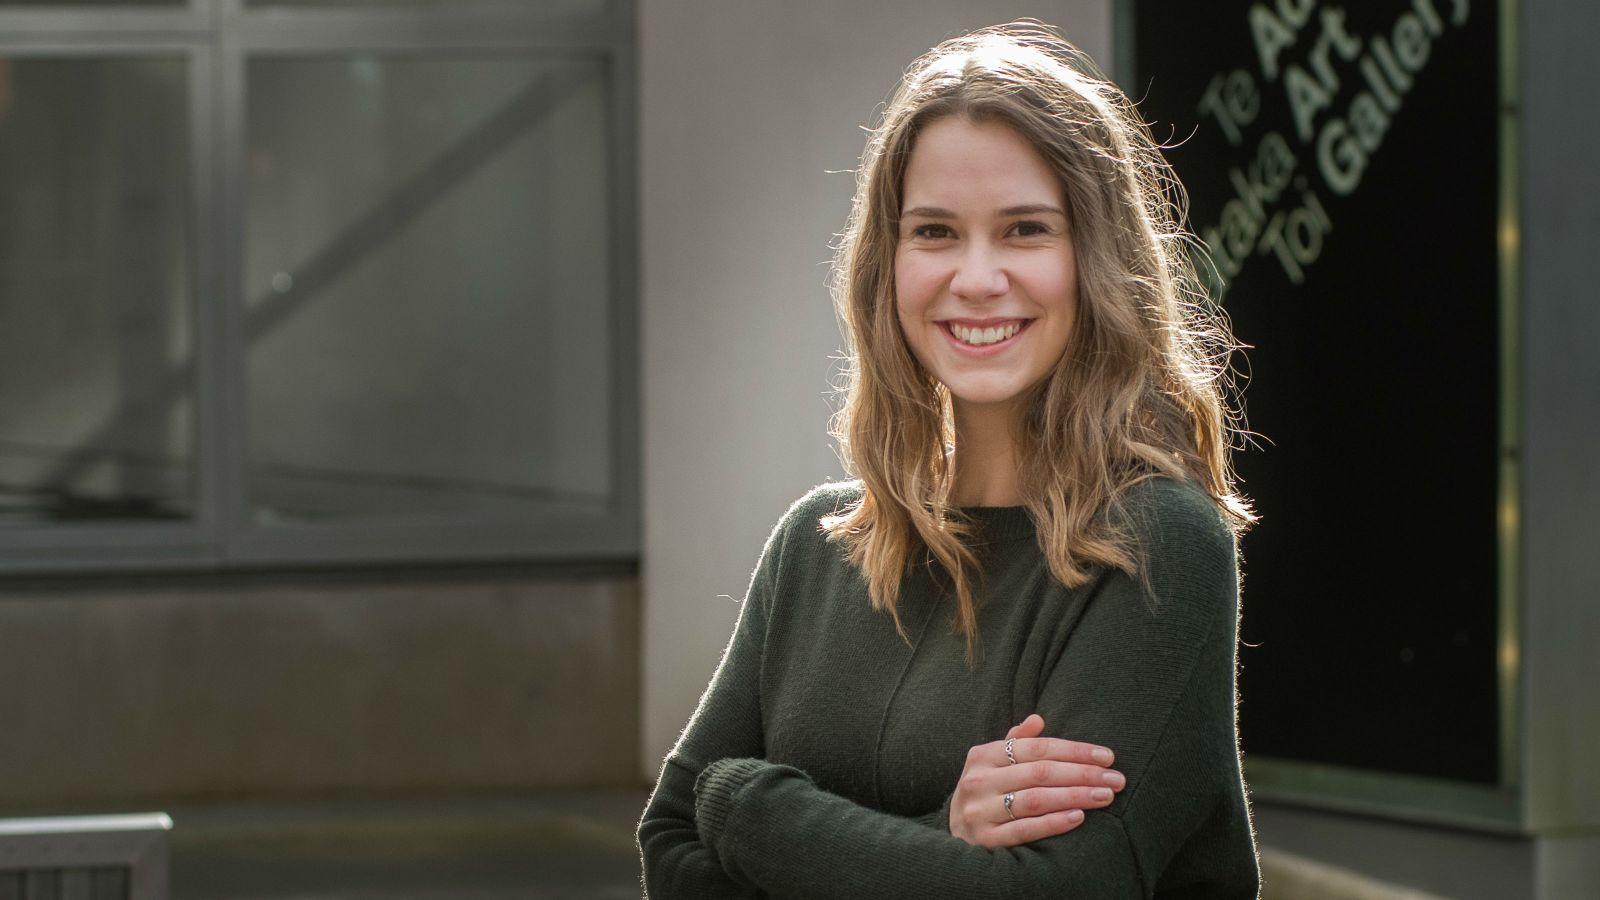 PhD candidate Amanda Wallis